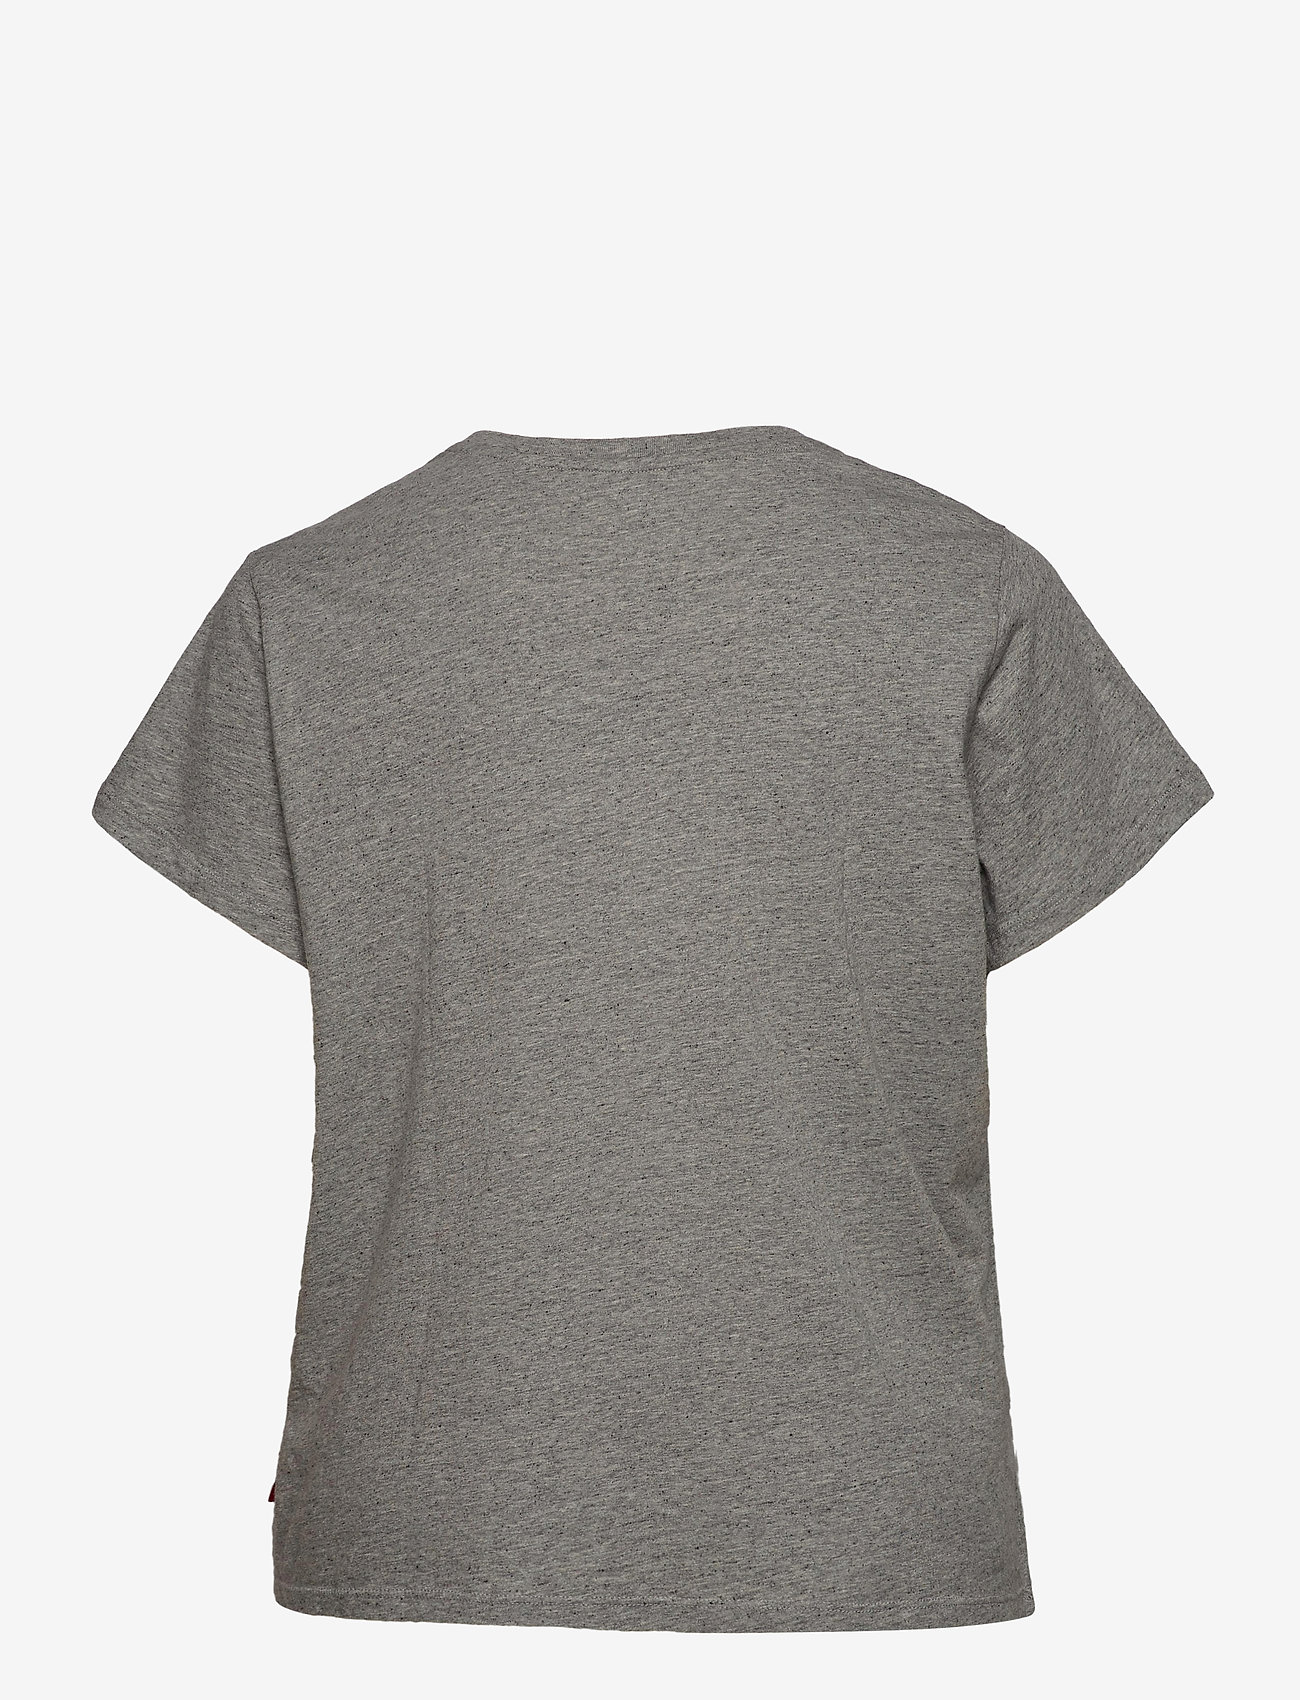 Levi's Plus Size - PL PERFECT TEE PLUS HOUSEMARK - t-shirt & tops - greys - 1